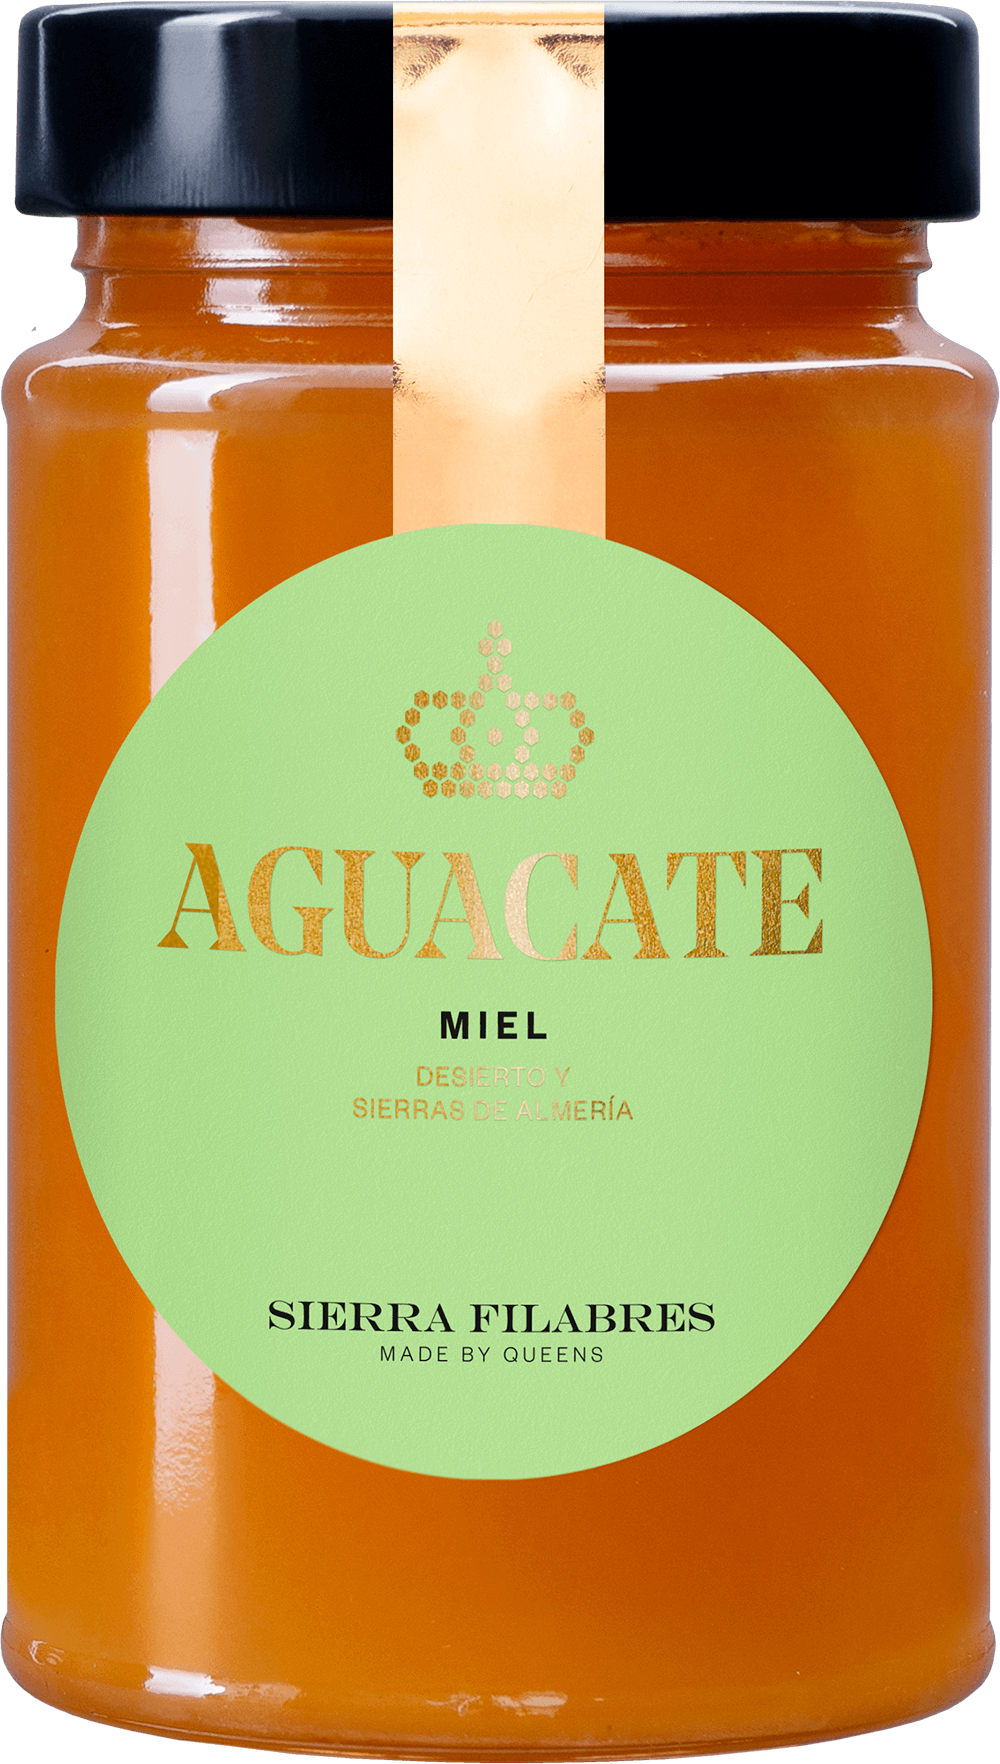 miel-clasica-aguacate